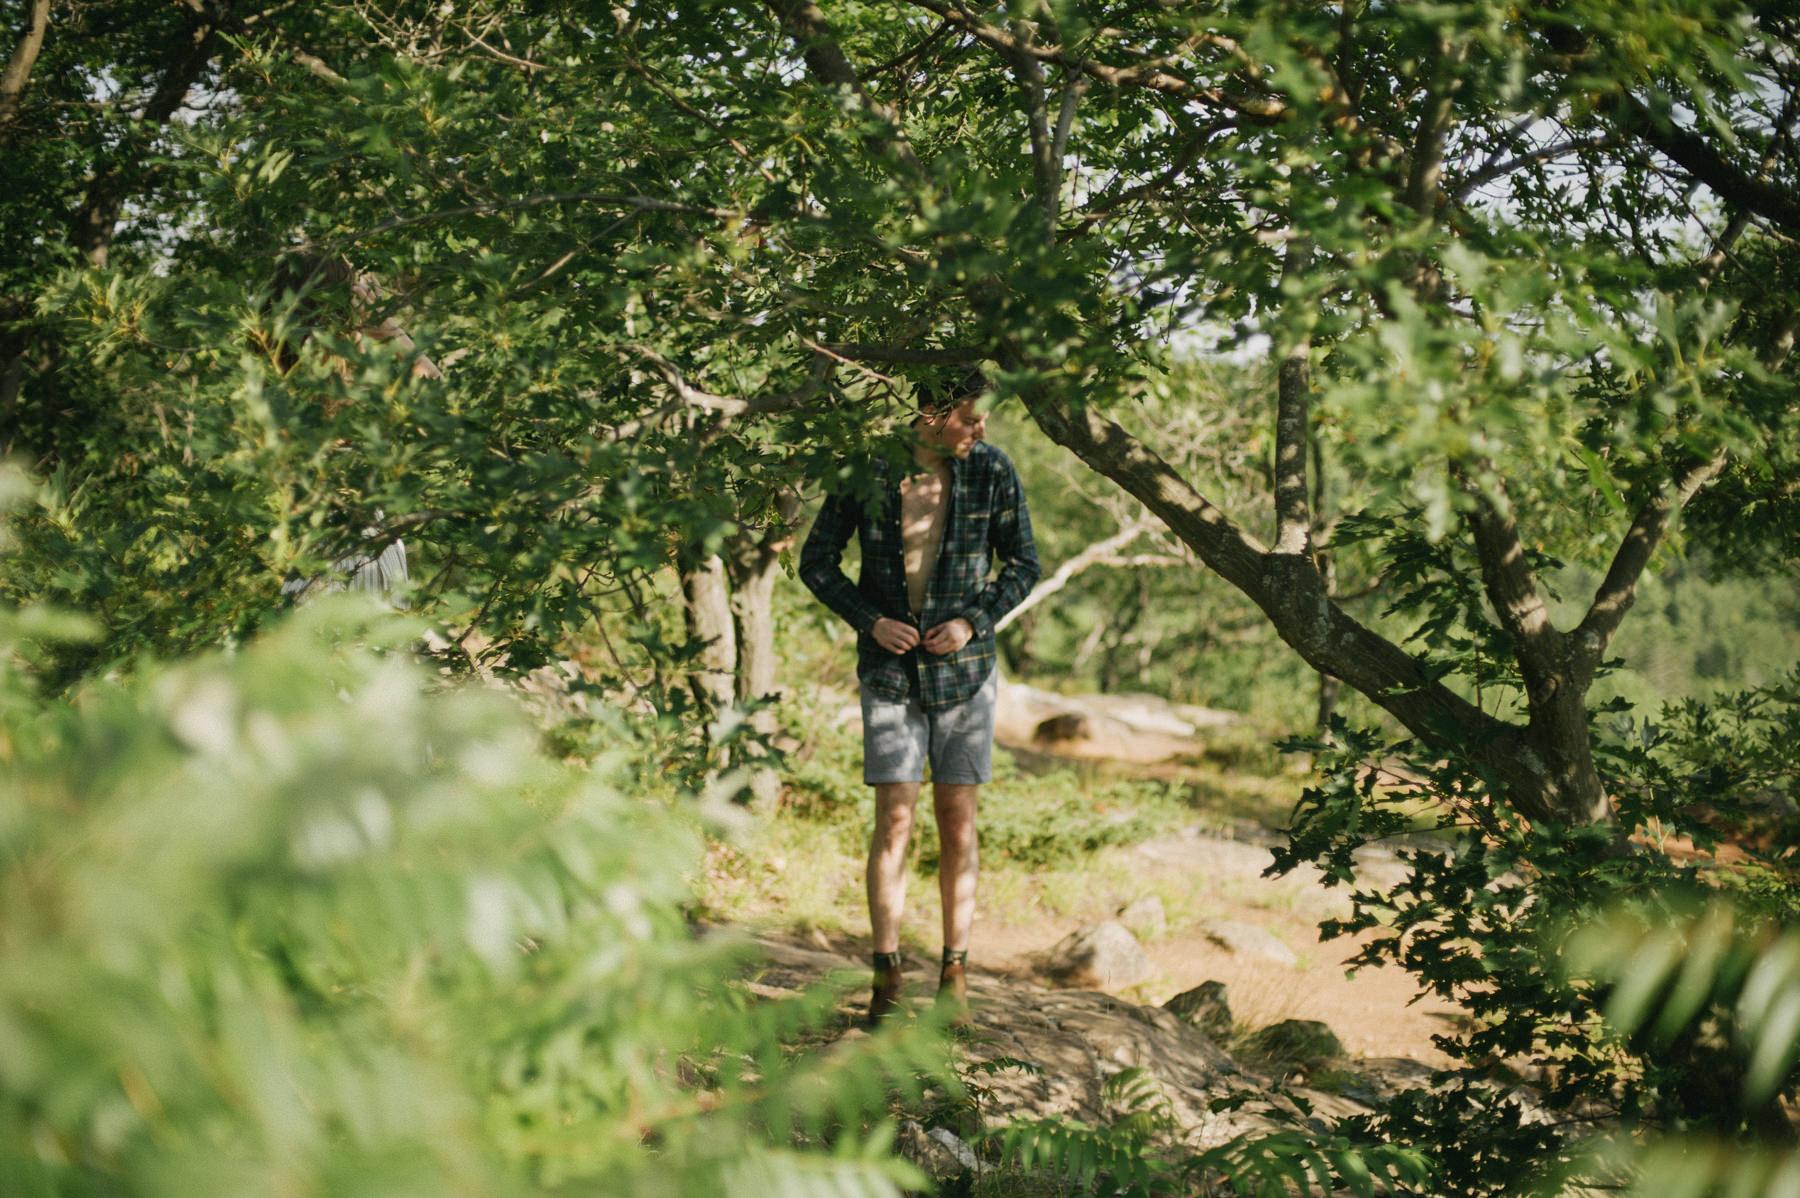 Daring Wanderer Photography - Daring Wanderer - Adeventurous engagement shoot - Bon Echo Engagement - Top Ontario wedding photographer - Toronto wedding photographer - adventure photography - adventure engagement shoot - bon echo provincial park - engagement - lakeside engagement - cliffside engagement - ontario engagement - adventure